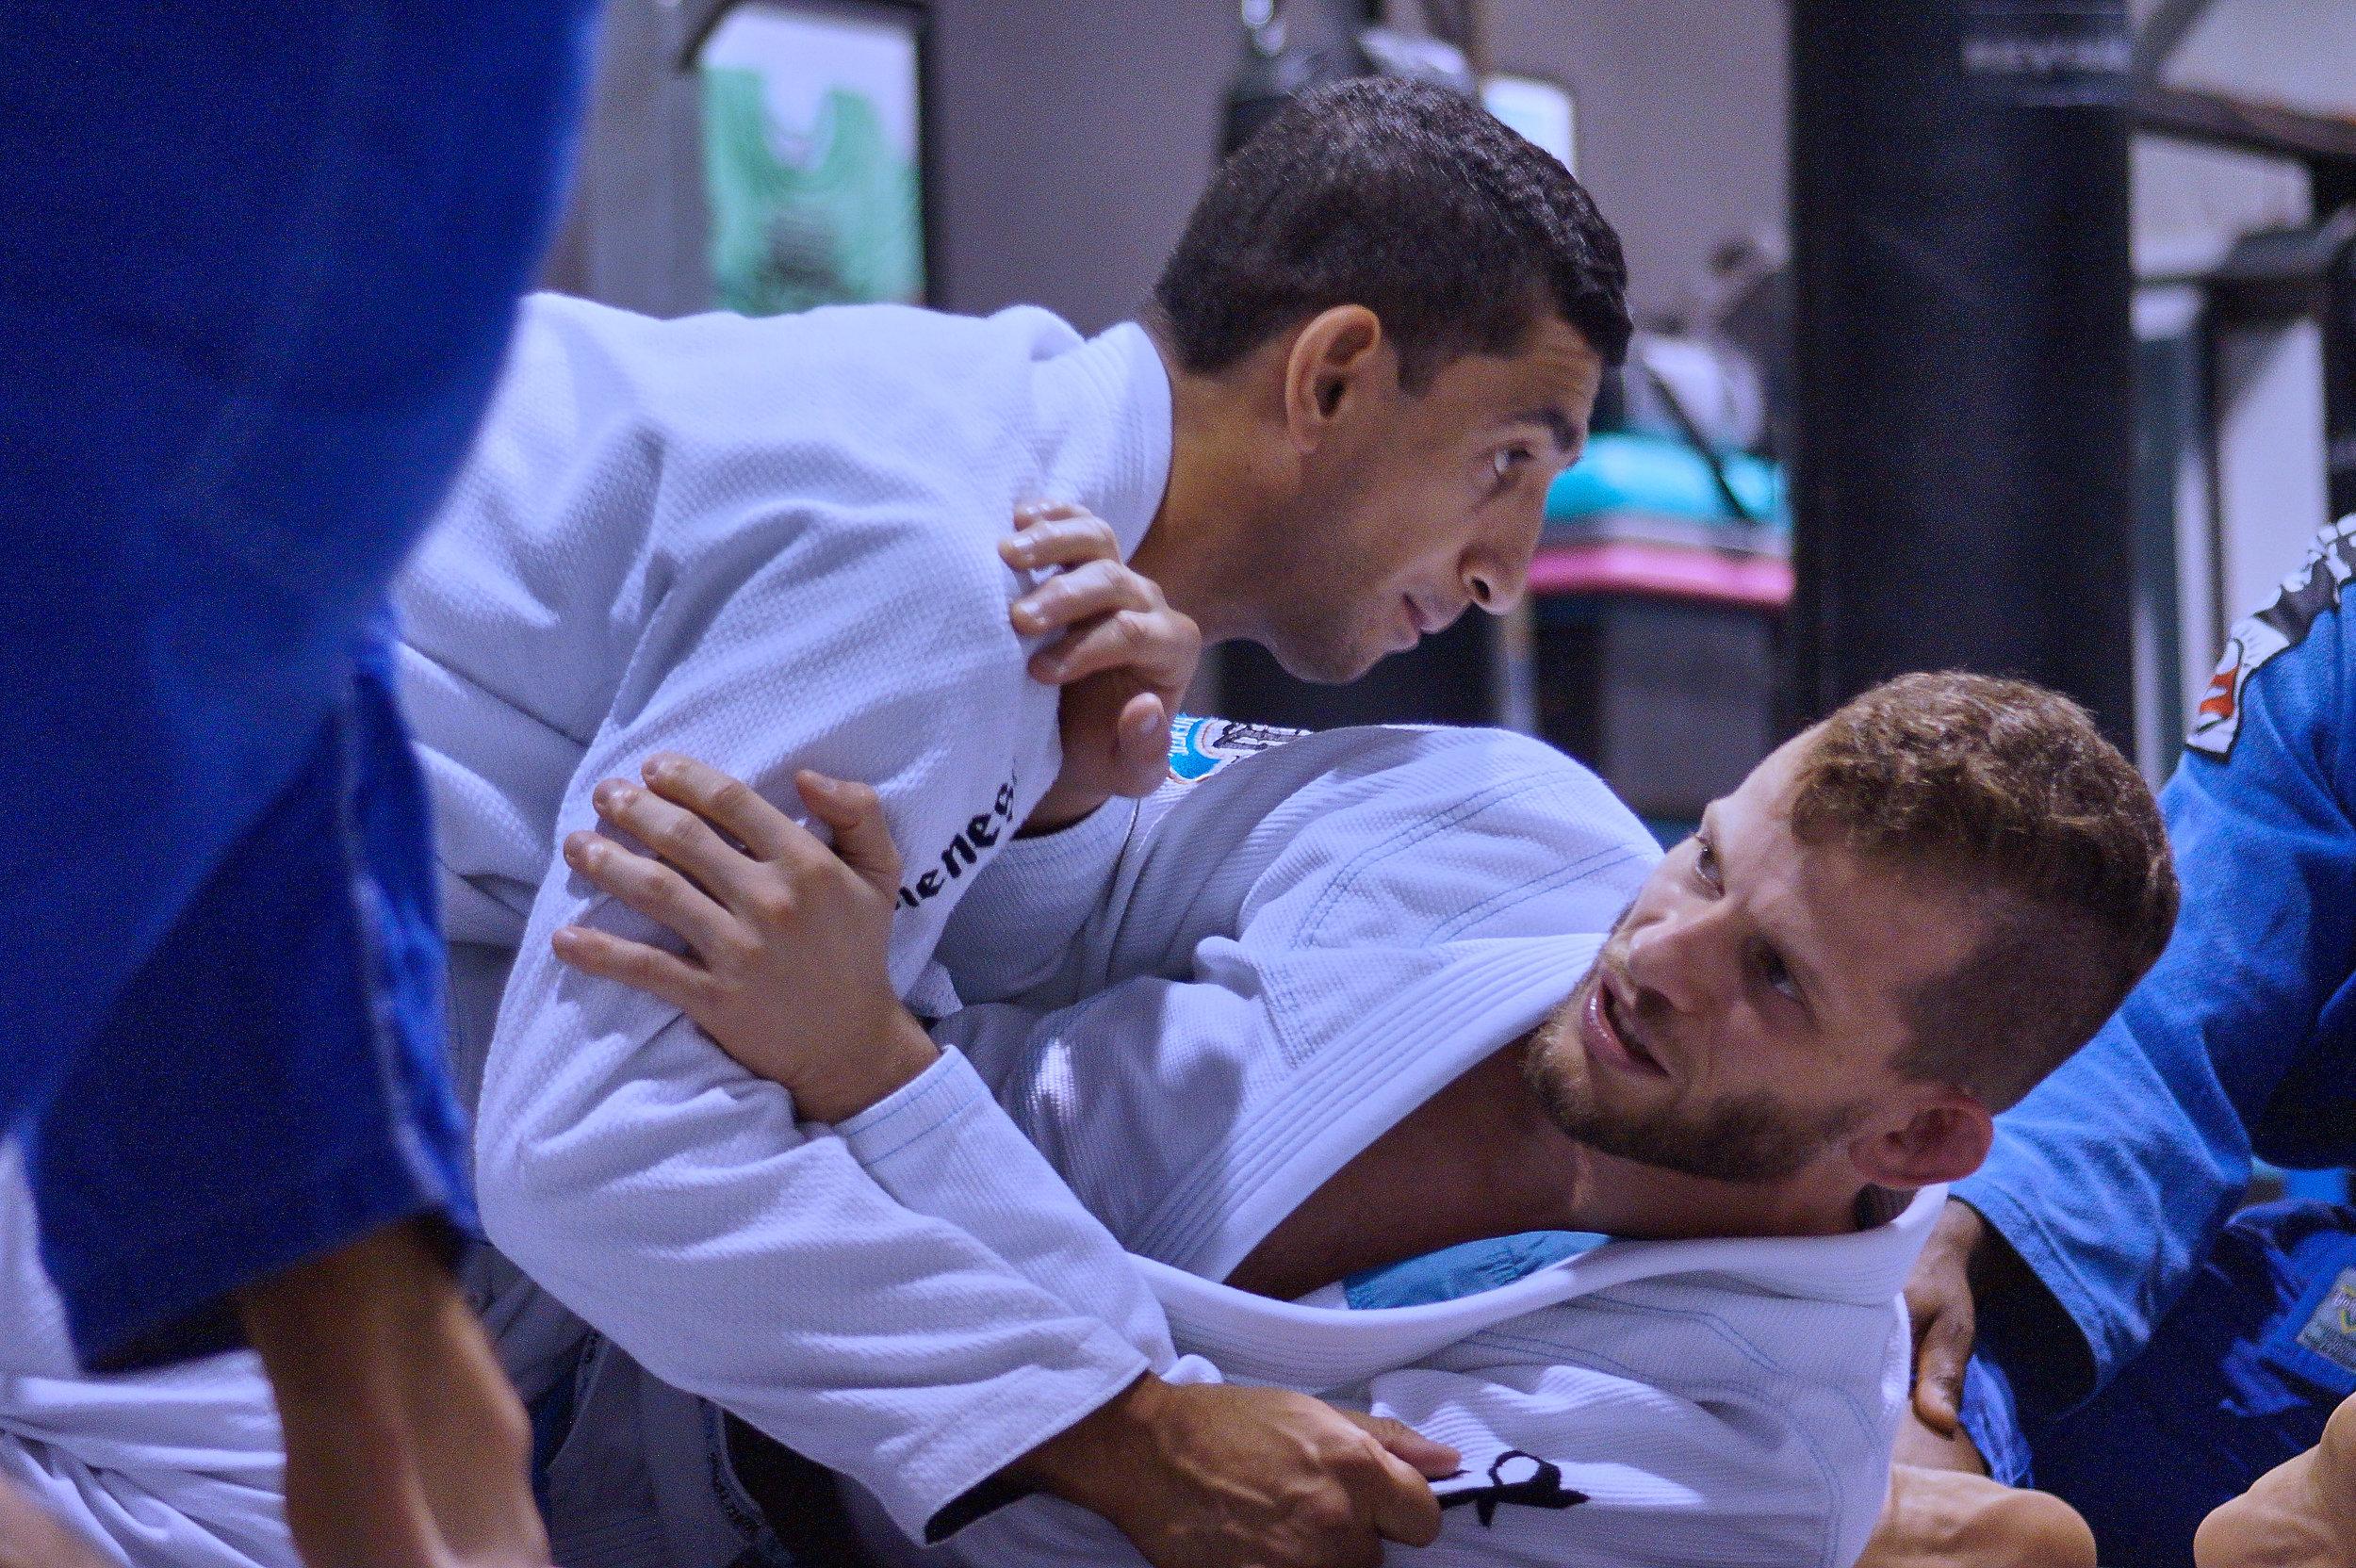 Milton Bastos, multiple time WORLD BJJ CHAMPION, showing Greubel's MMA students some finer points Brazilian Jiu-jitsu. Milton (bottom) pictured with Ares BJJ black belt Ale Nogueira (top).